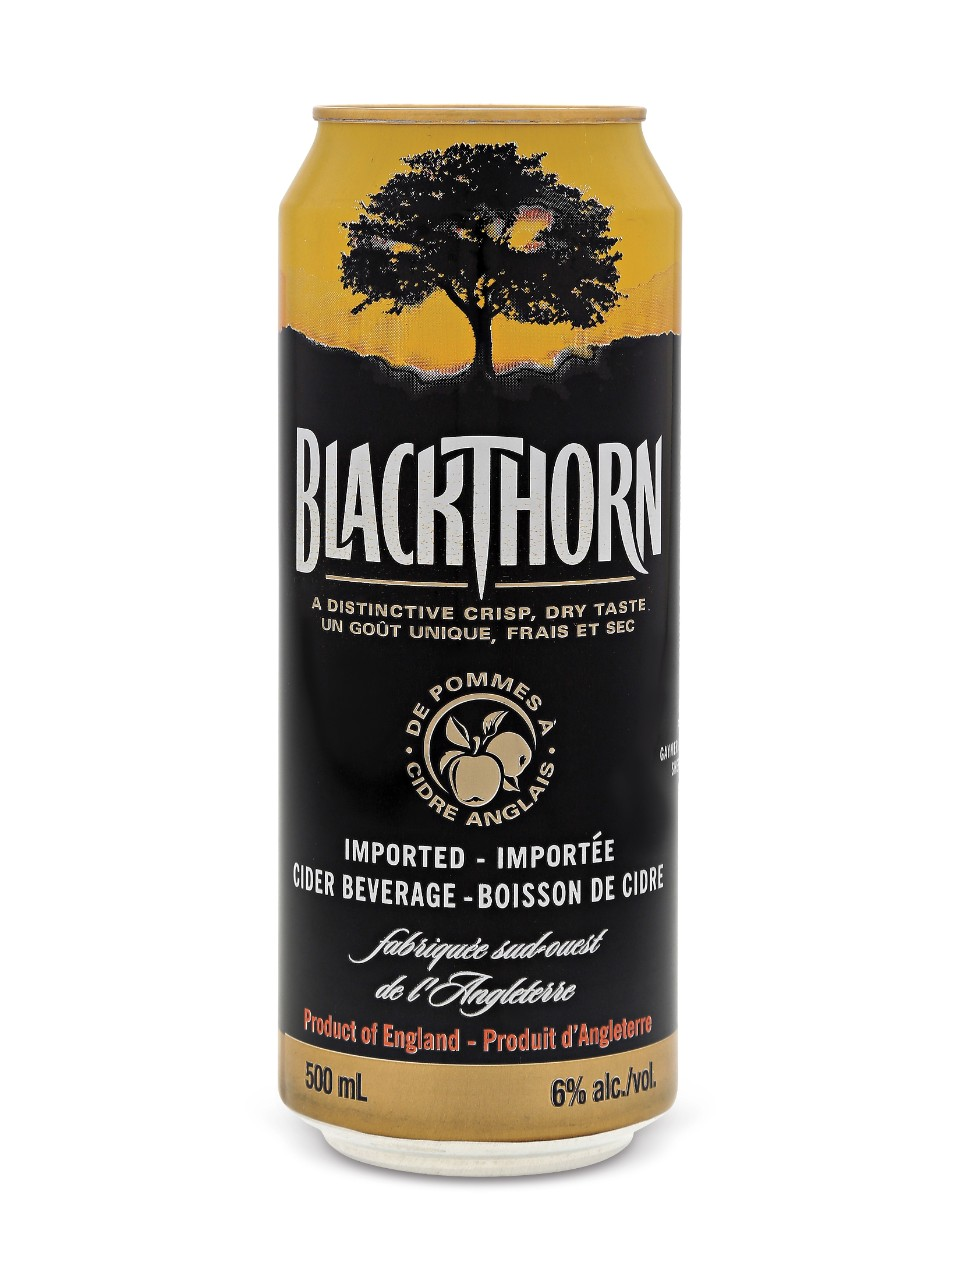 Blackthorn Cider Lcbo